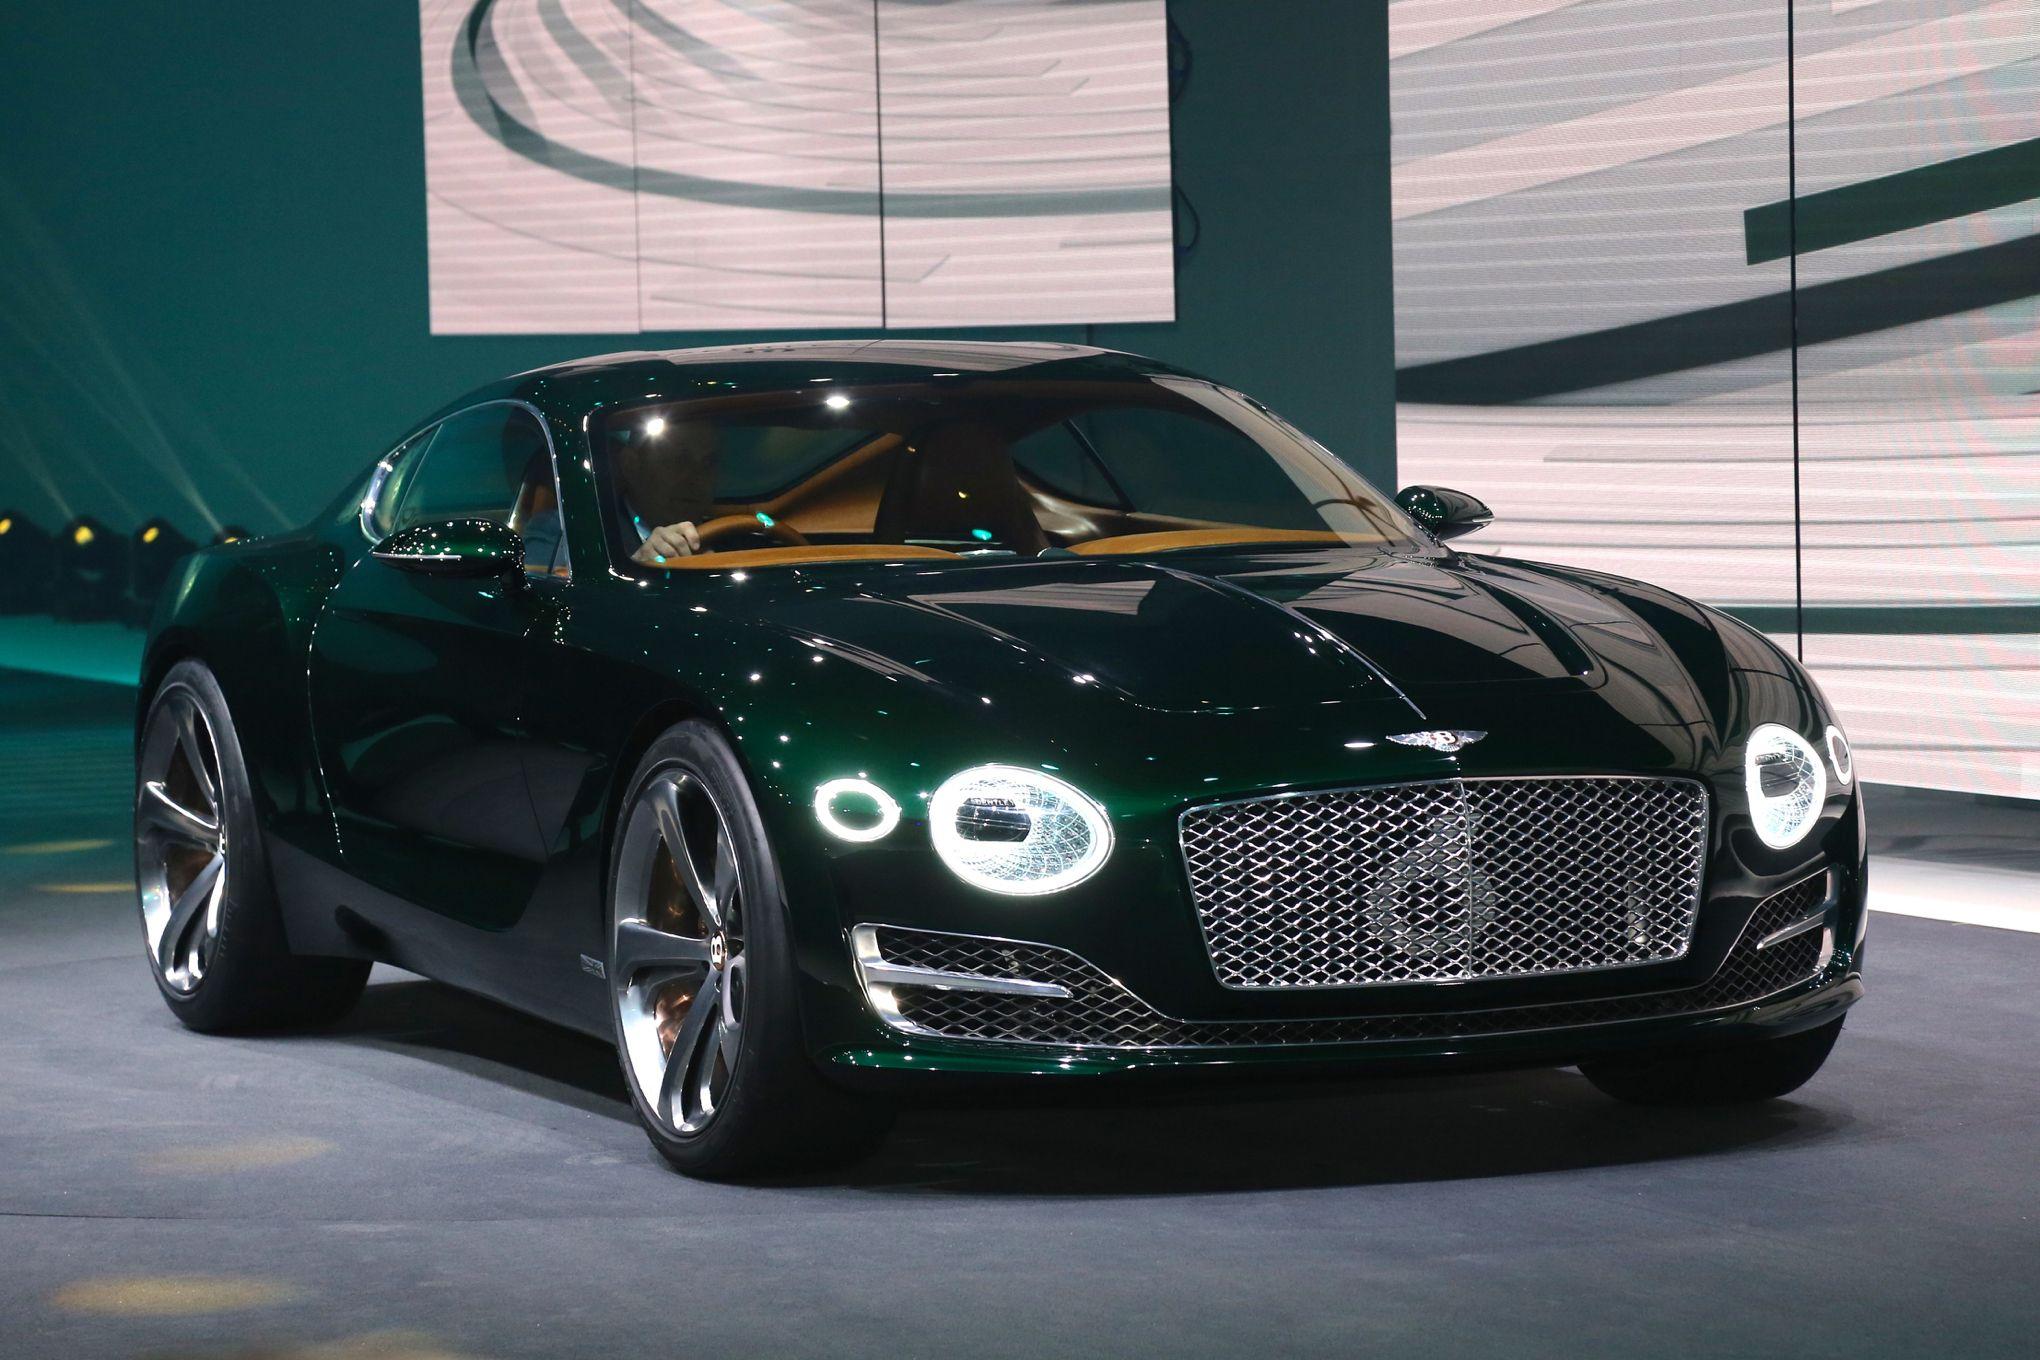 bentley exp 10 speed 6 concept front three quarter 02 | dream car